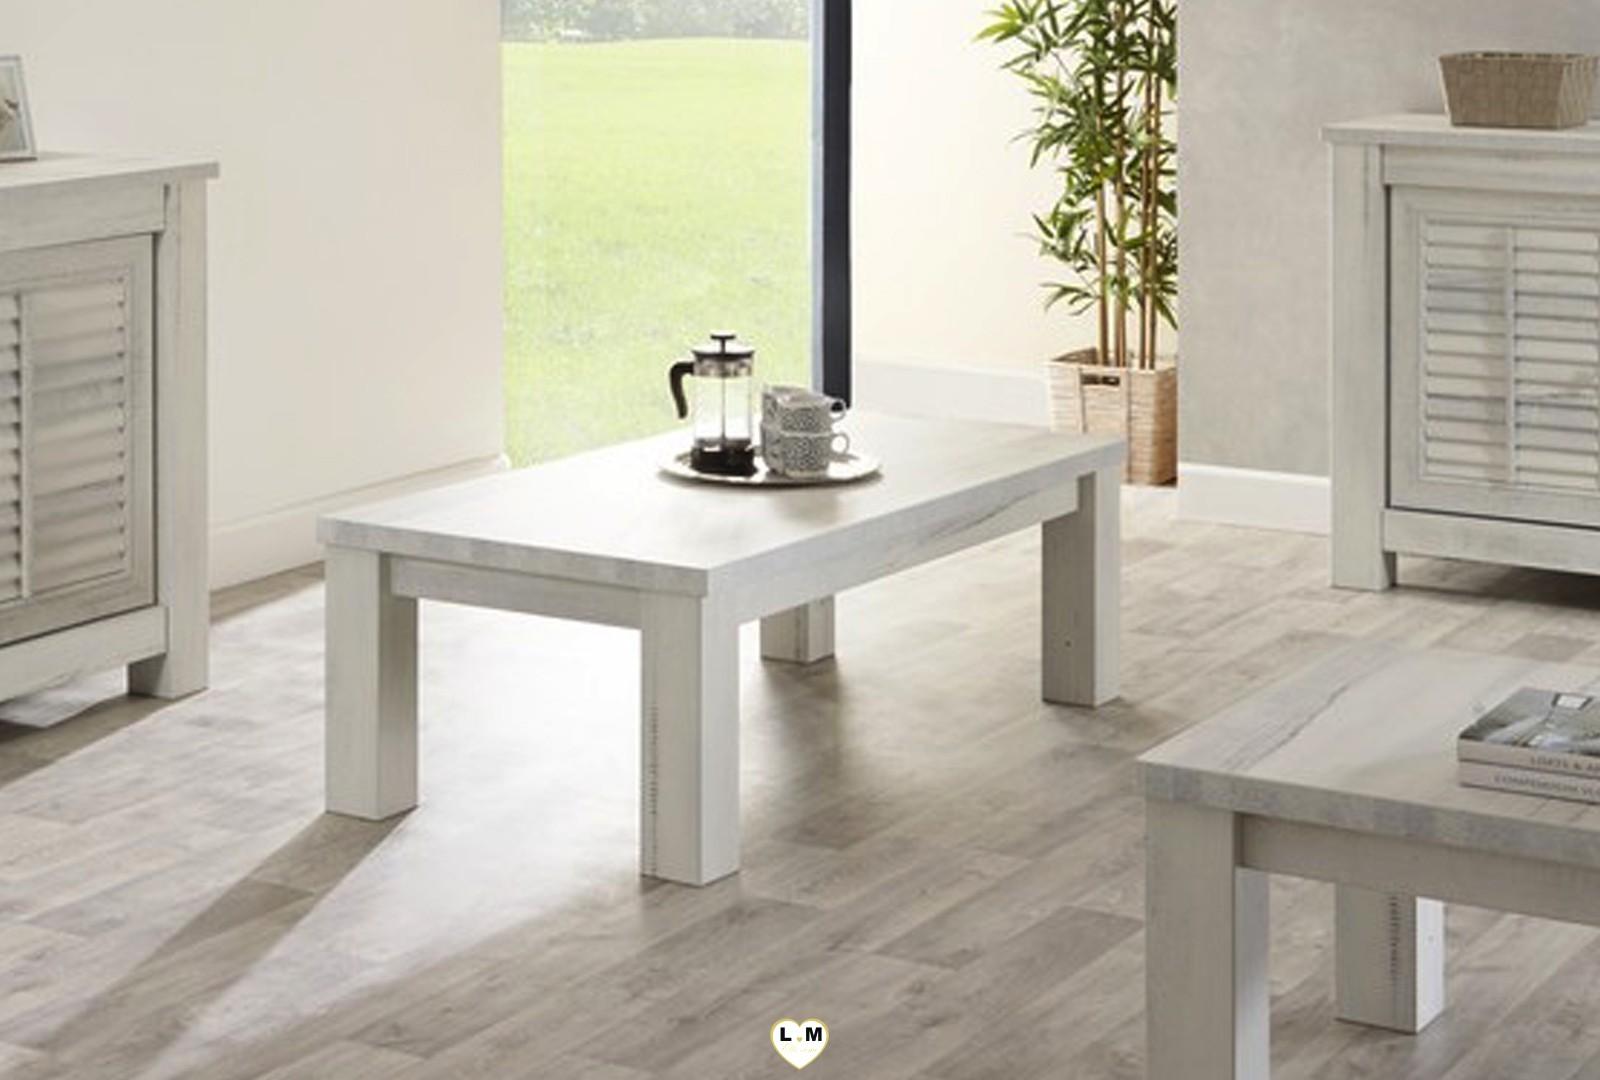 Table Bois Vieilli Blanc